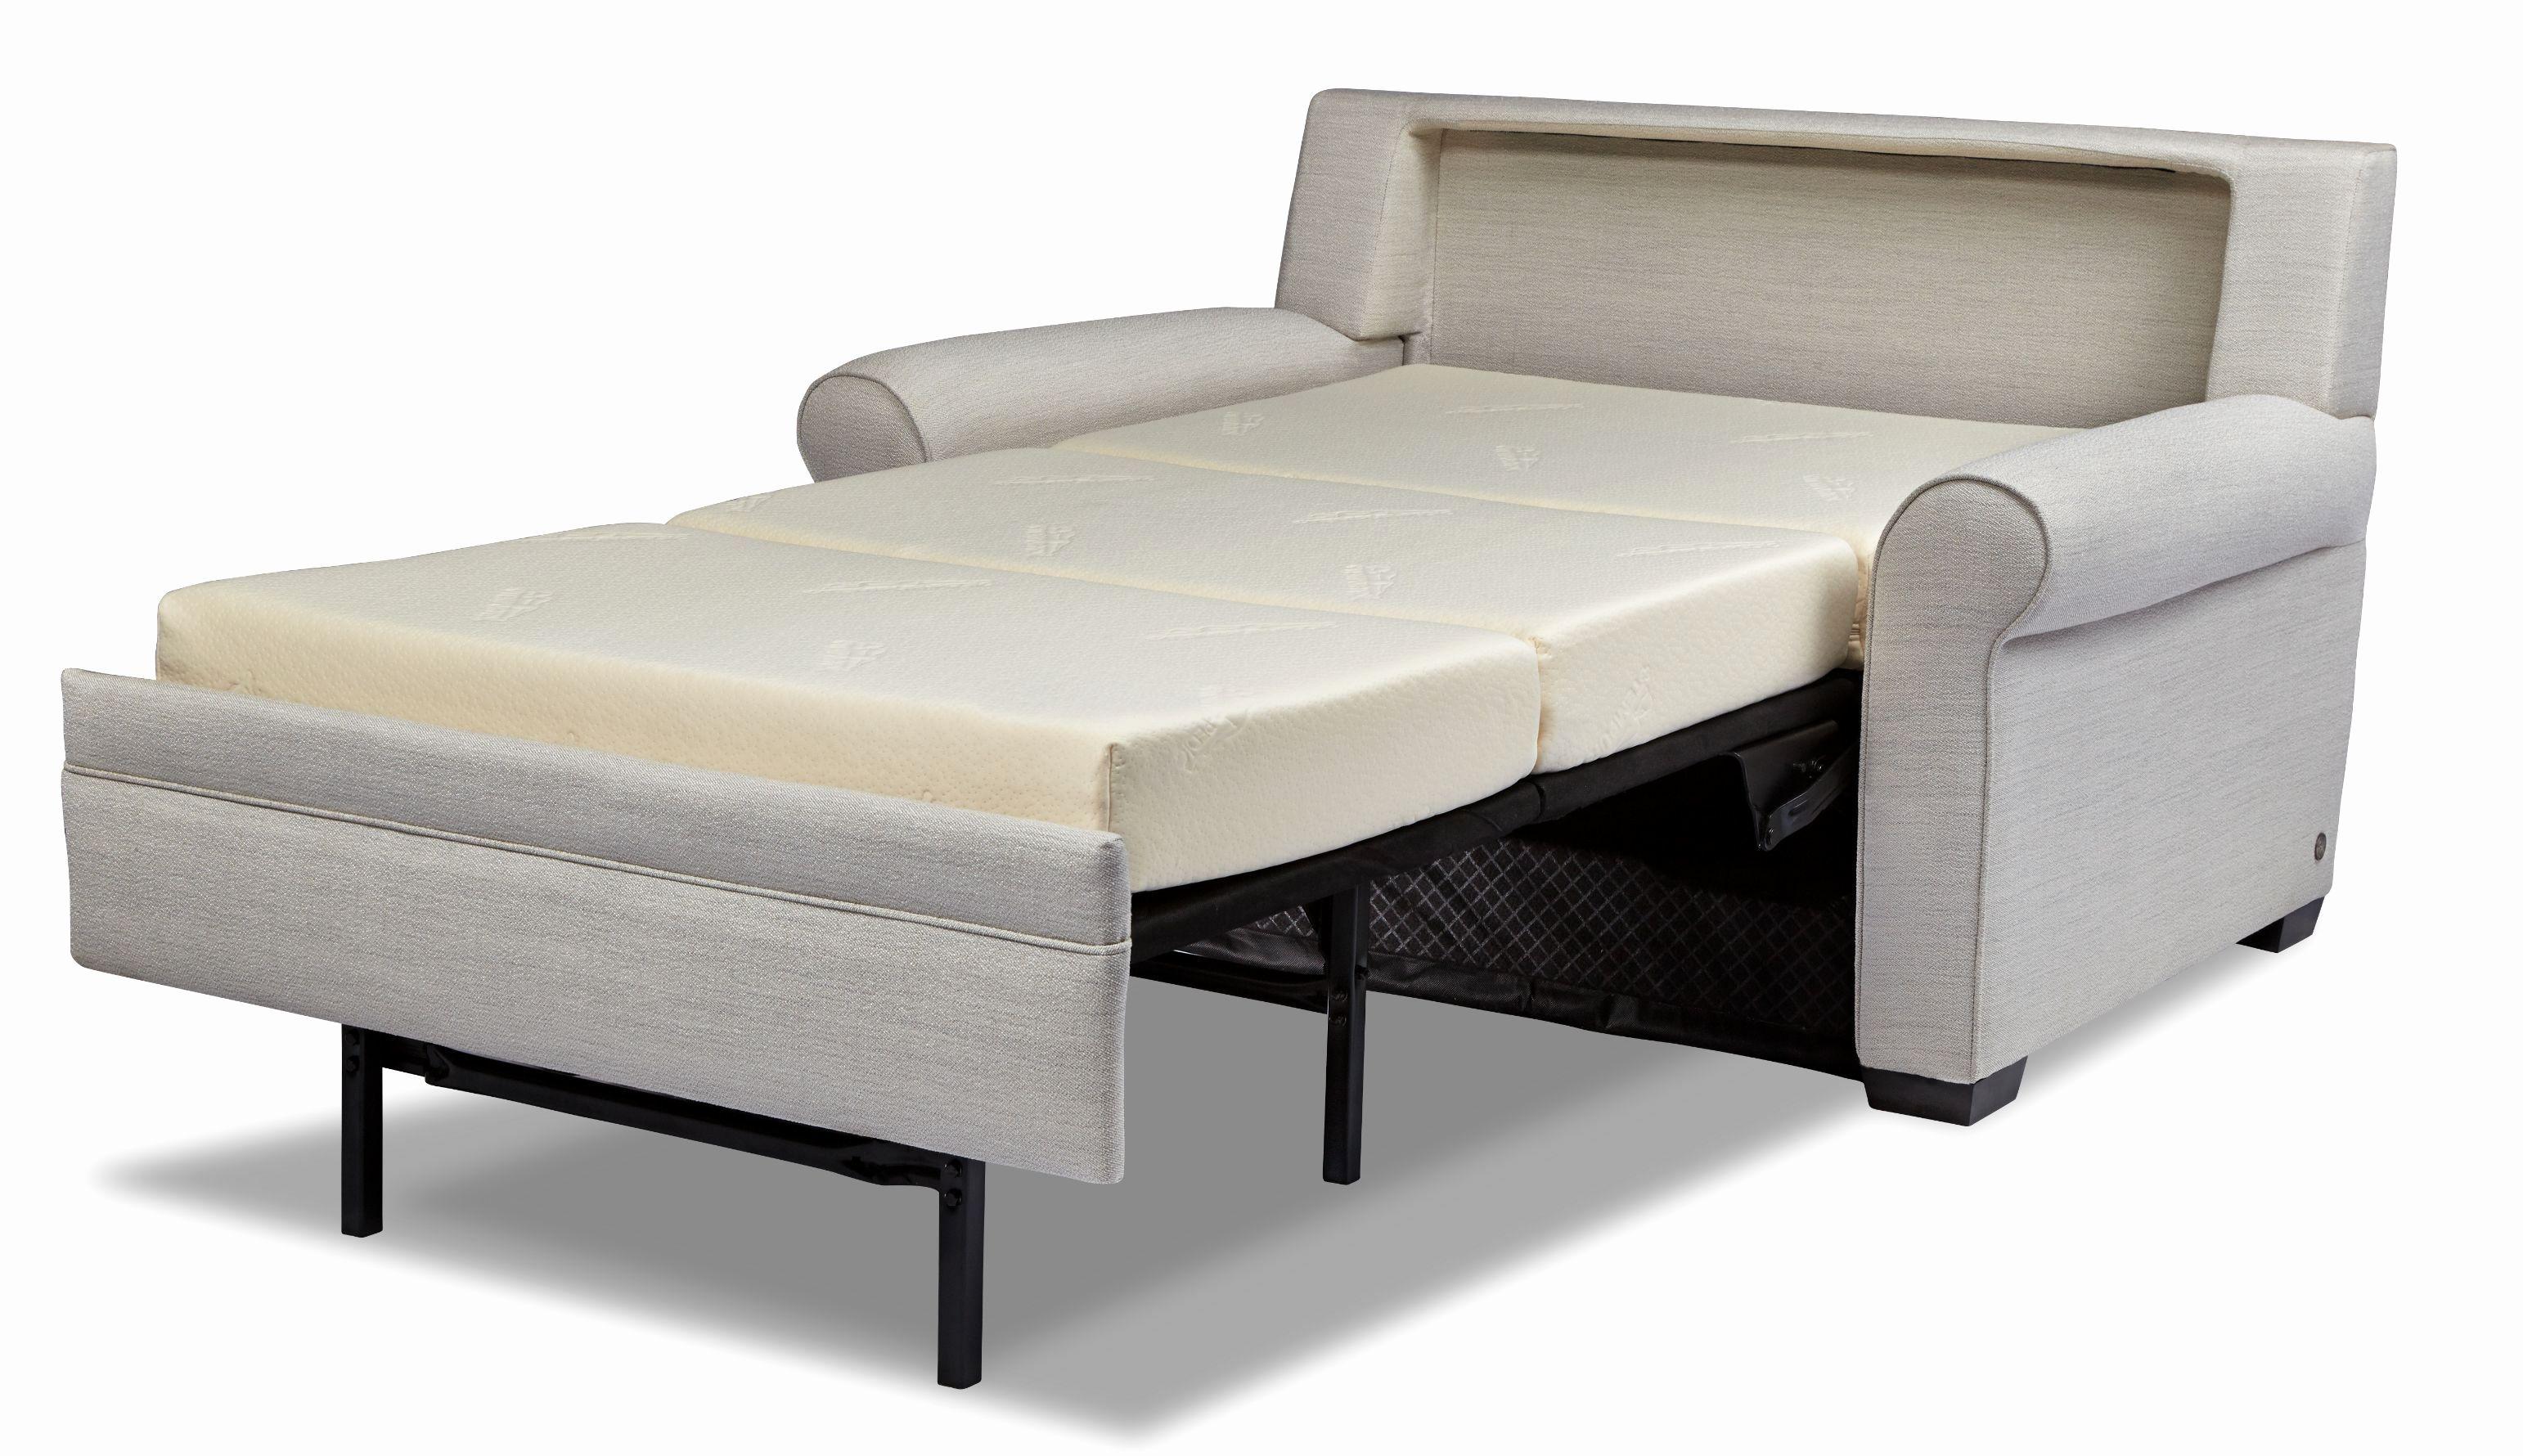 comfortable sleeper sofa. Elegant Comfortable Sleeper Sofas Pics Beautiful Gina Convertible Fort SleeperSofa Seattle